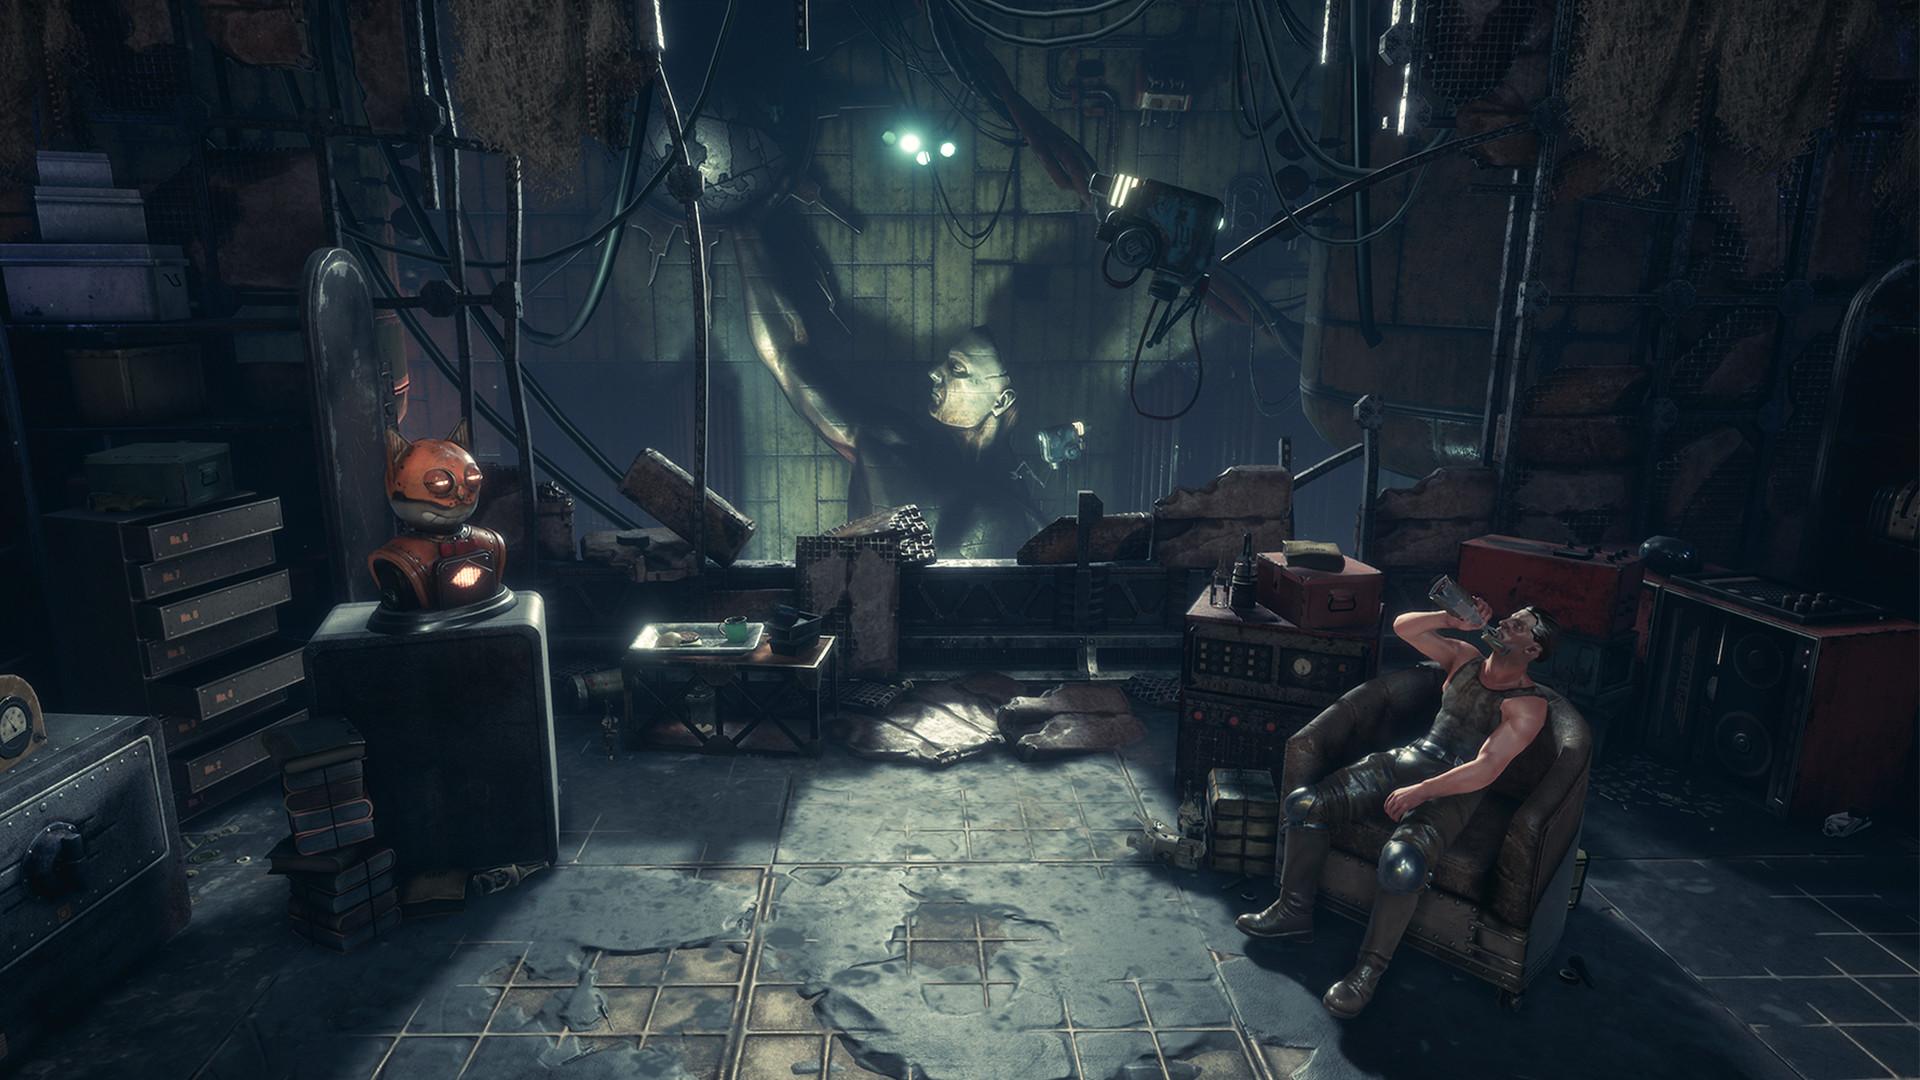 Insomnia: The Ark Screenshot 11 - Bilderquelle: HeroCraft